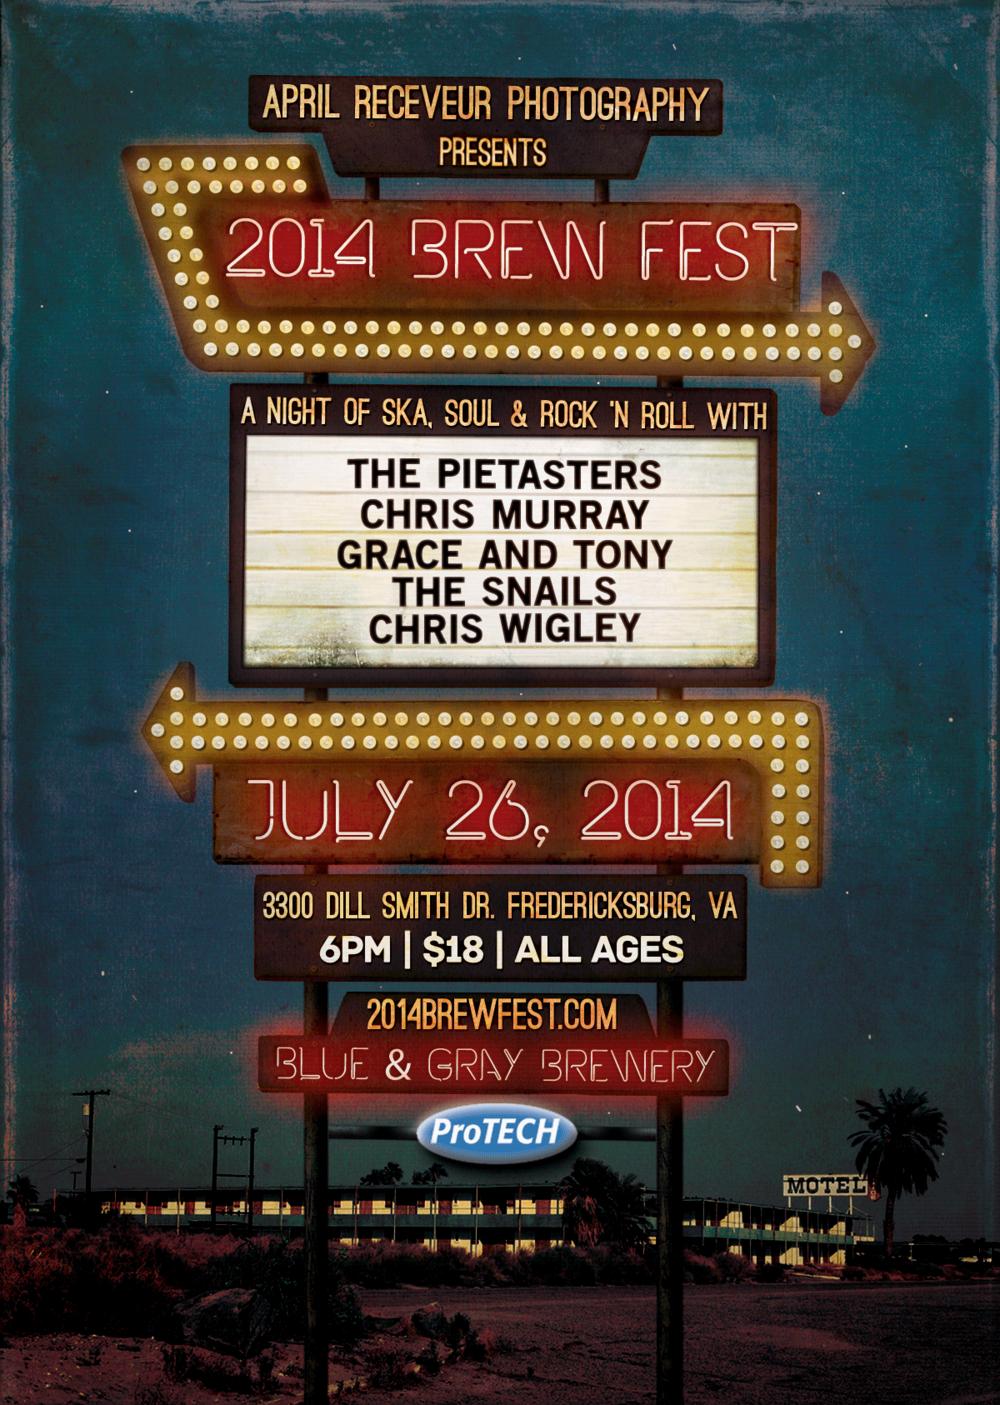 2014brewfest.png